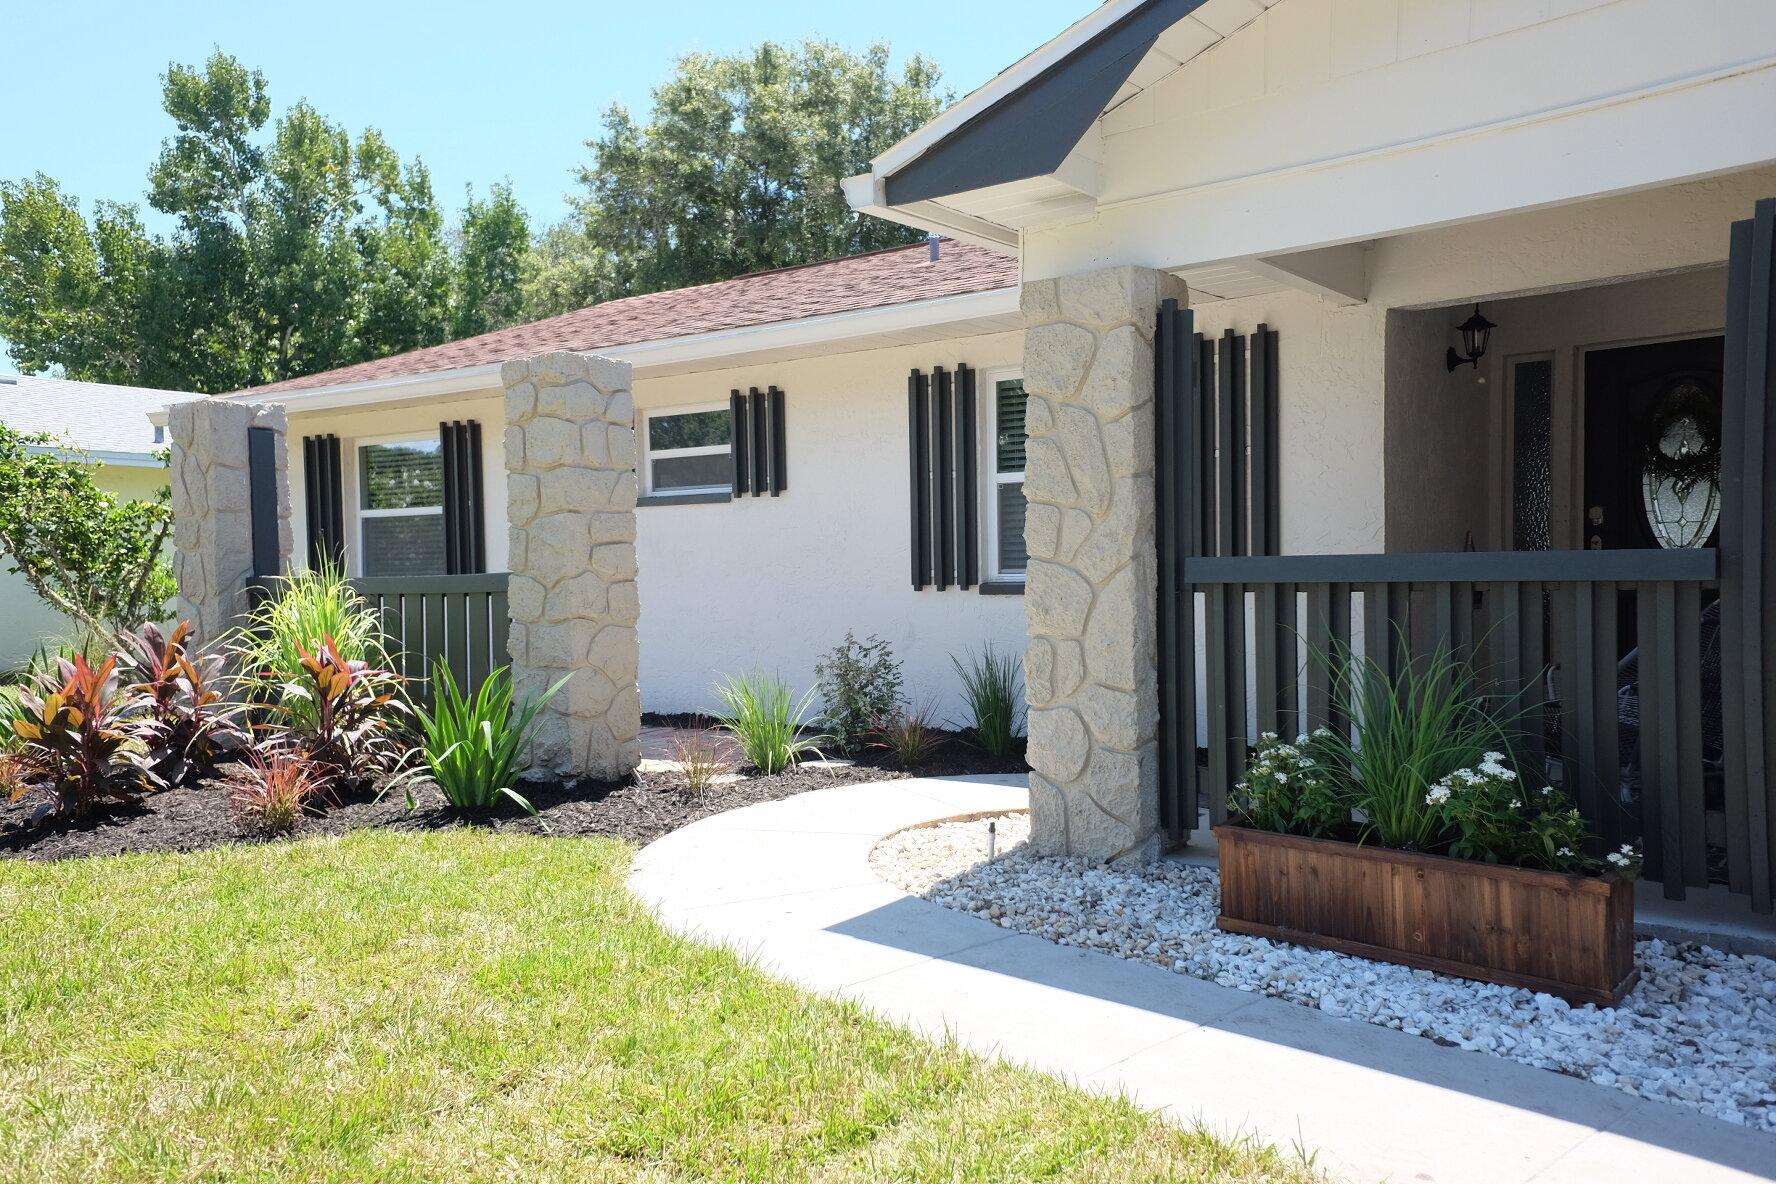 Our Modern Coastal Cottage in Dunedin, FL